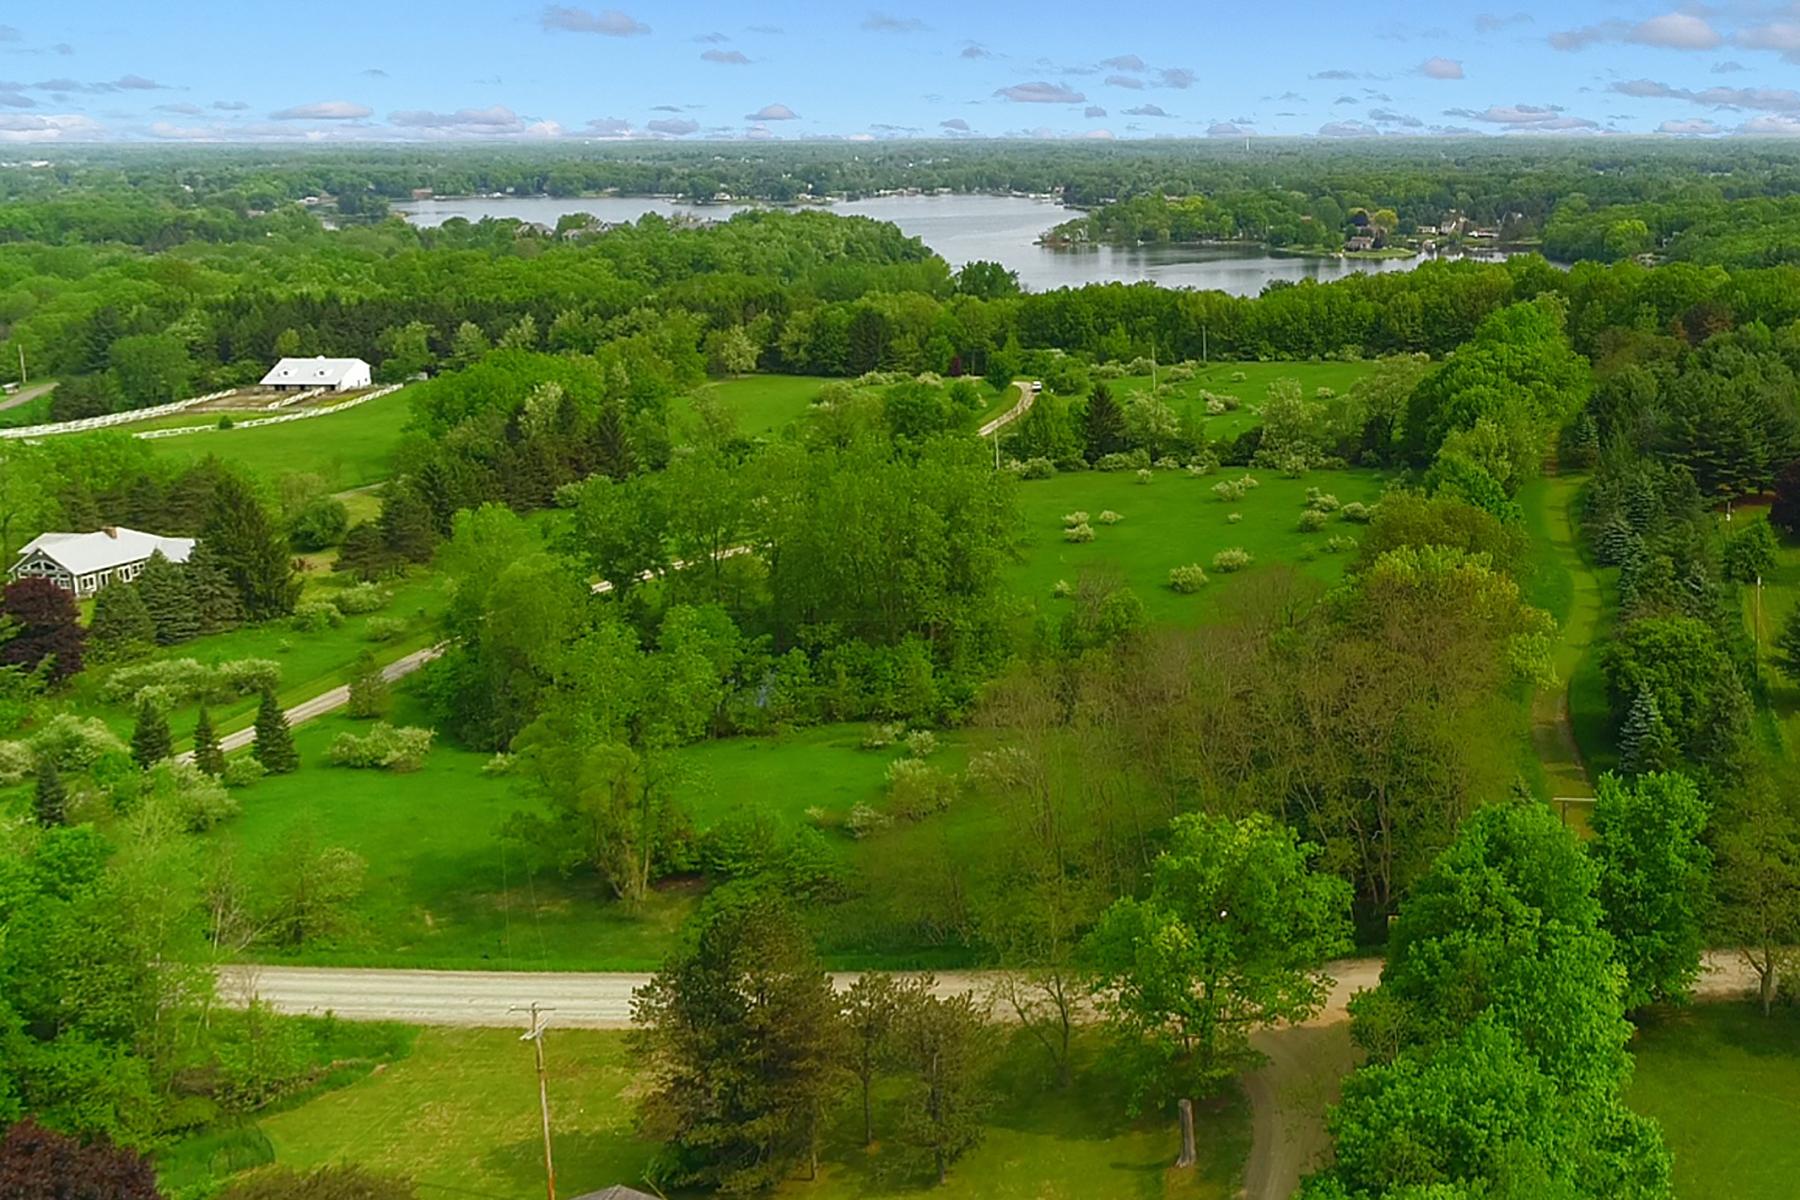 Land for Sale at 0000 Horton, Atlas Twp 0000 Horton Goodrich, Michigan 48438 United States